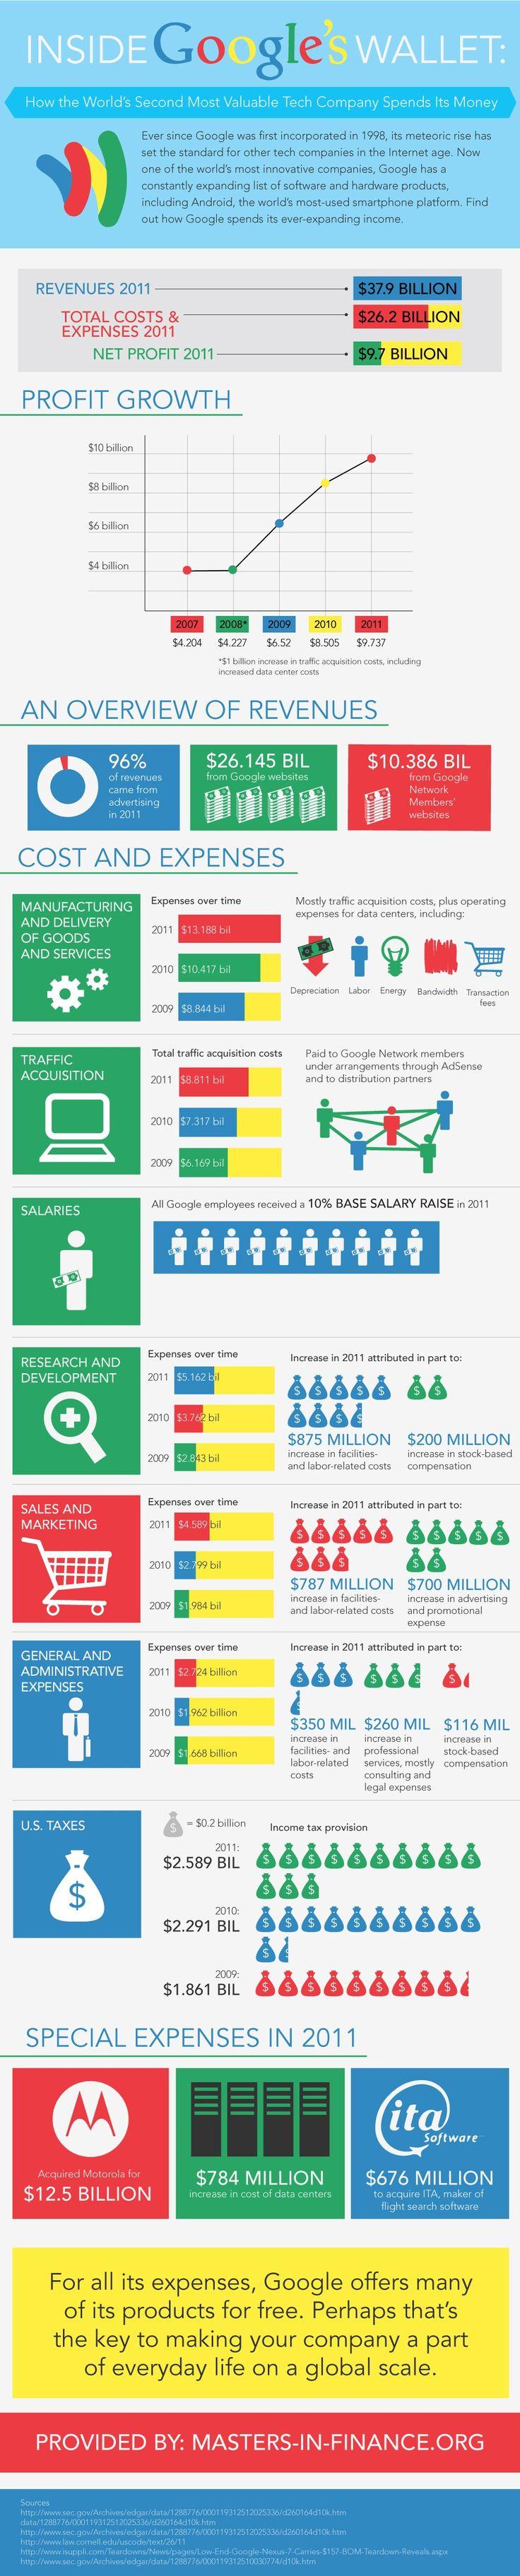 Inside Google's Wallet. #infographic